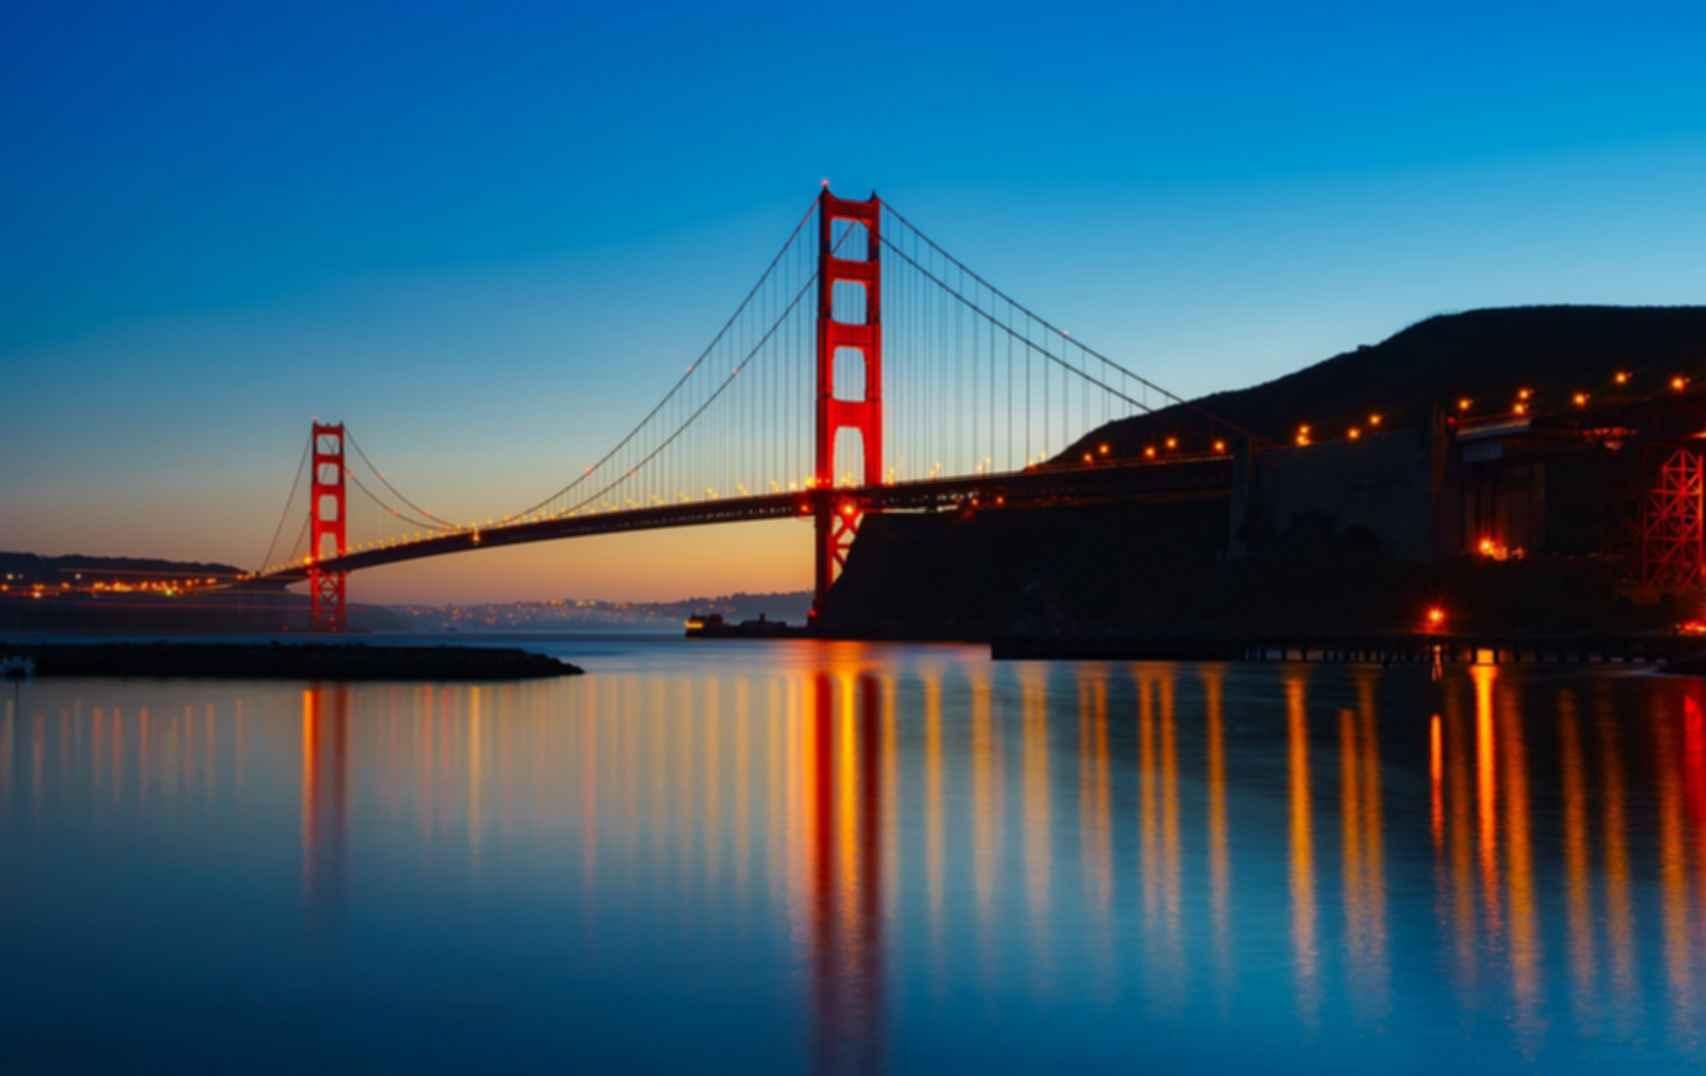 Golden Gate Bridge - At Dusk